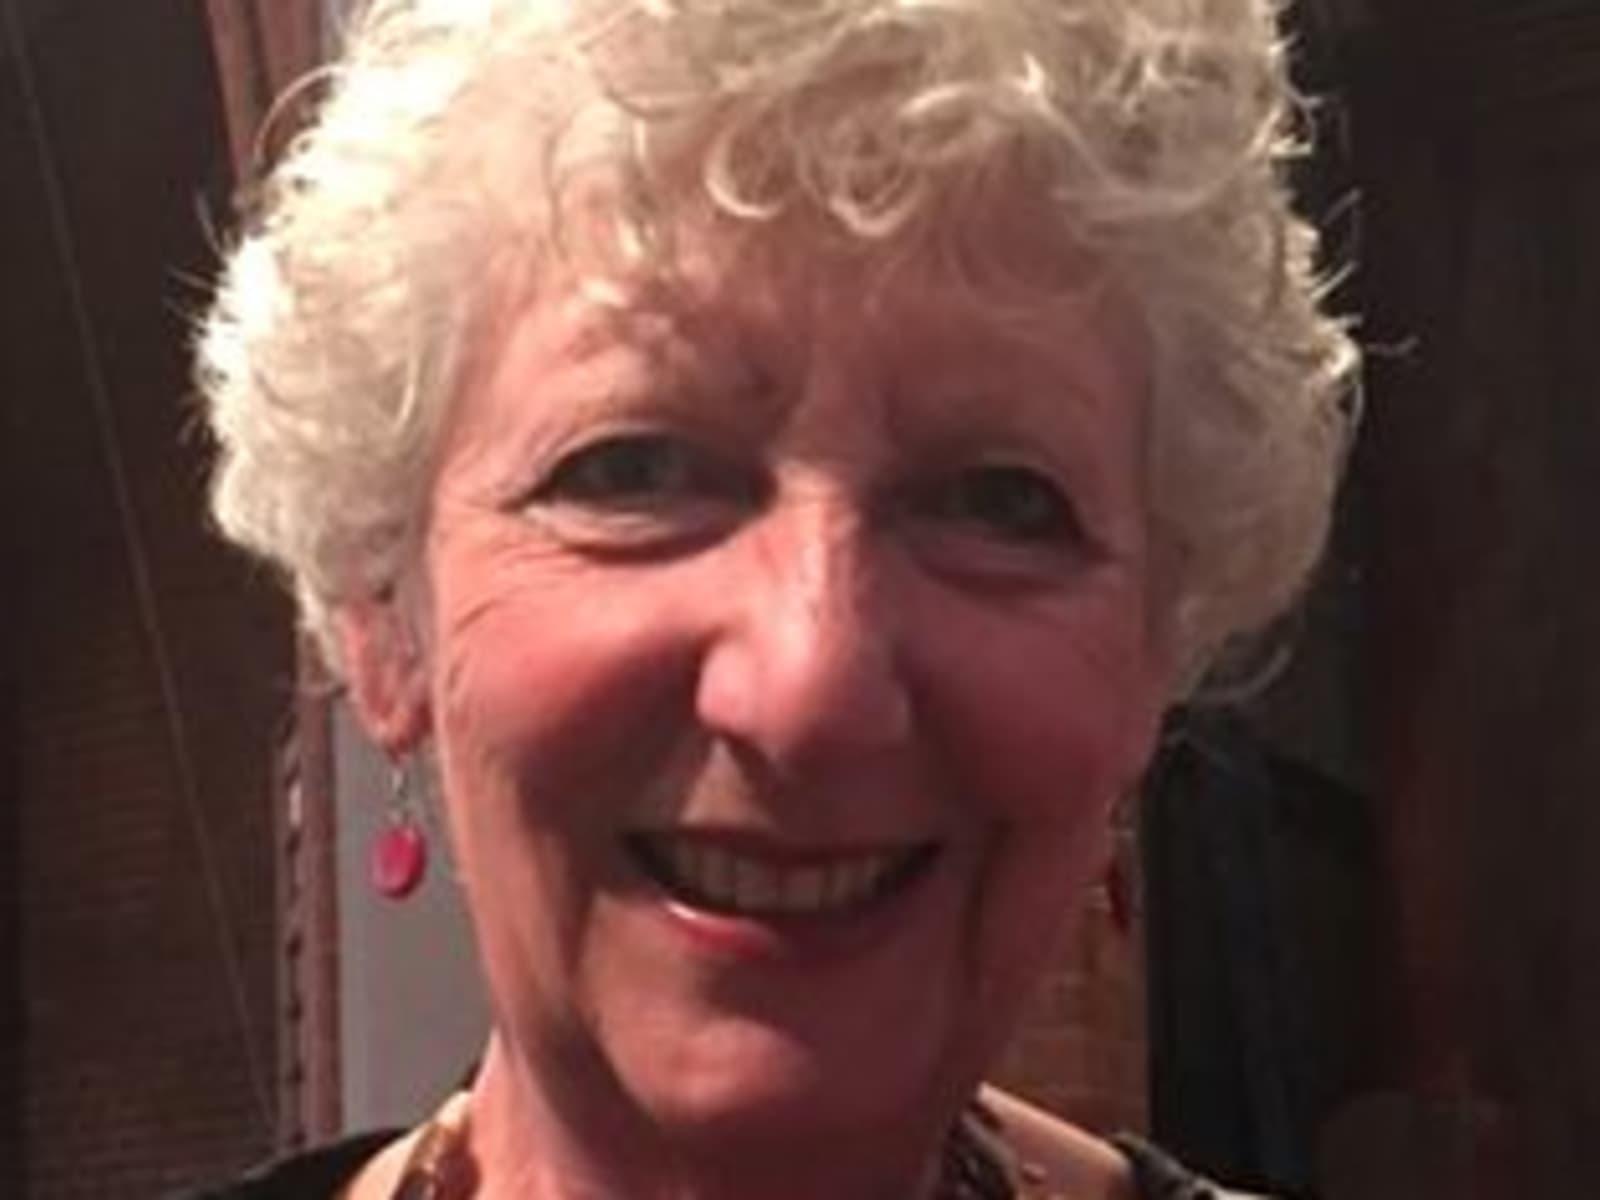 Janey from London, United Kingdom